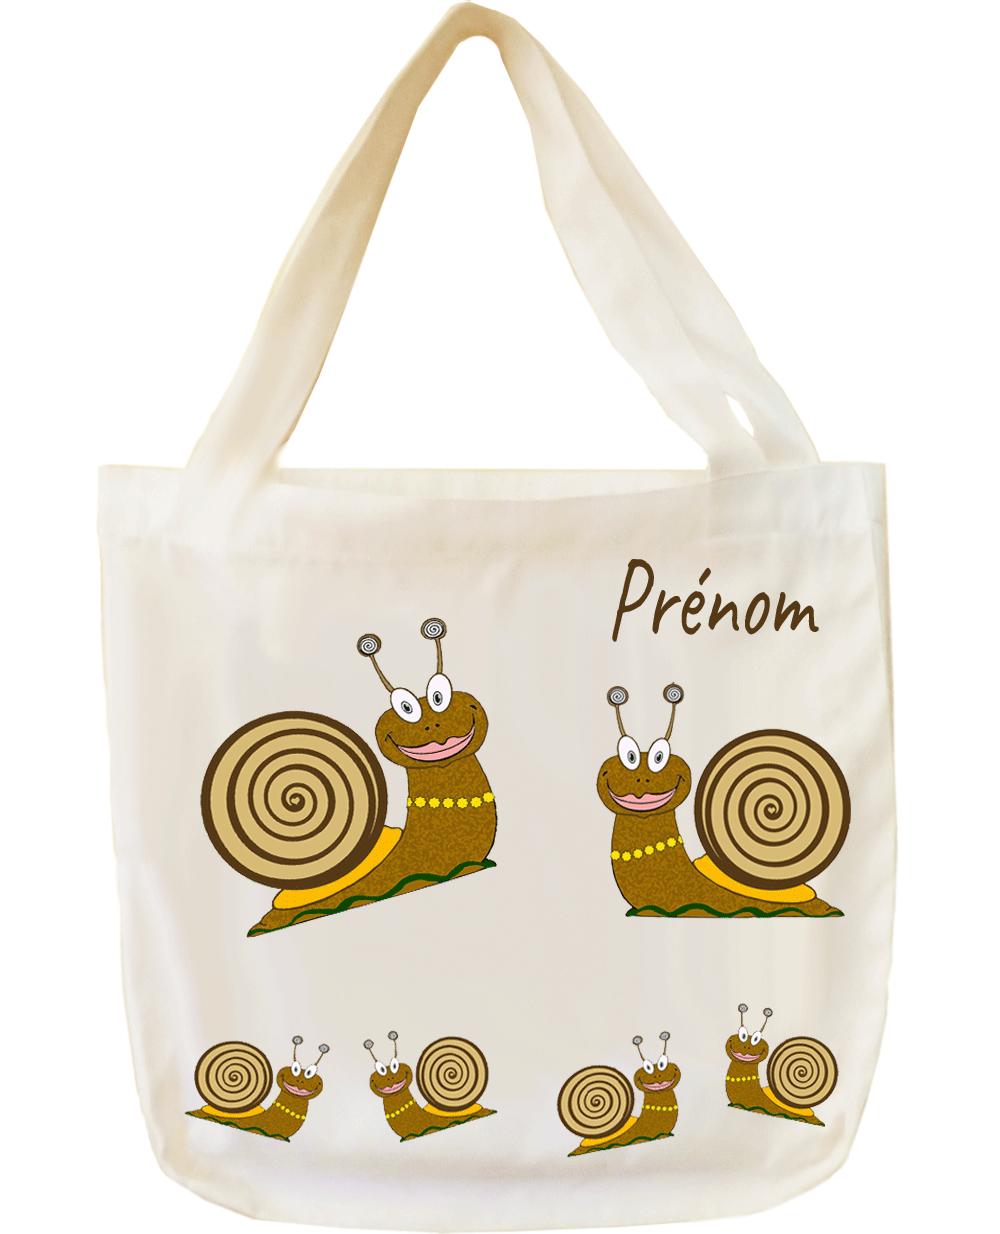 tote-bag;sac;cabas;texti;cadeaux;personnalisable;personnalisation;personnalise;prenom;animal;escargot